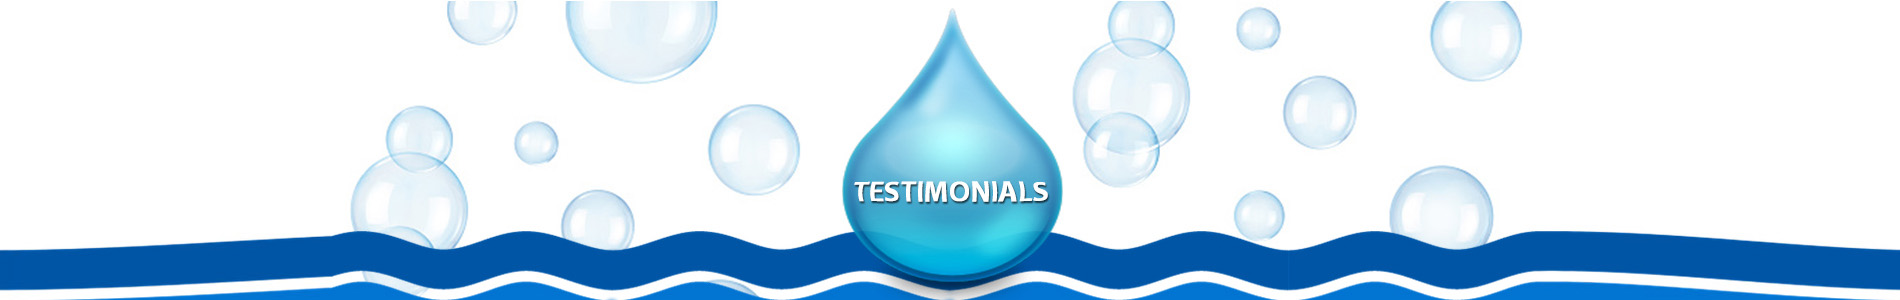 page1-testimonials